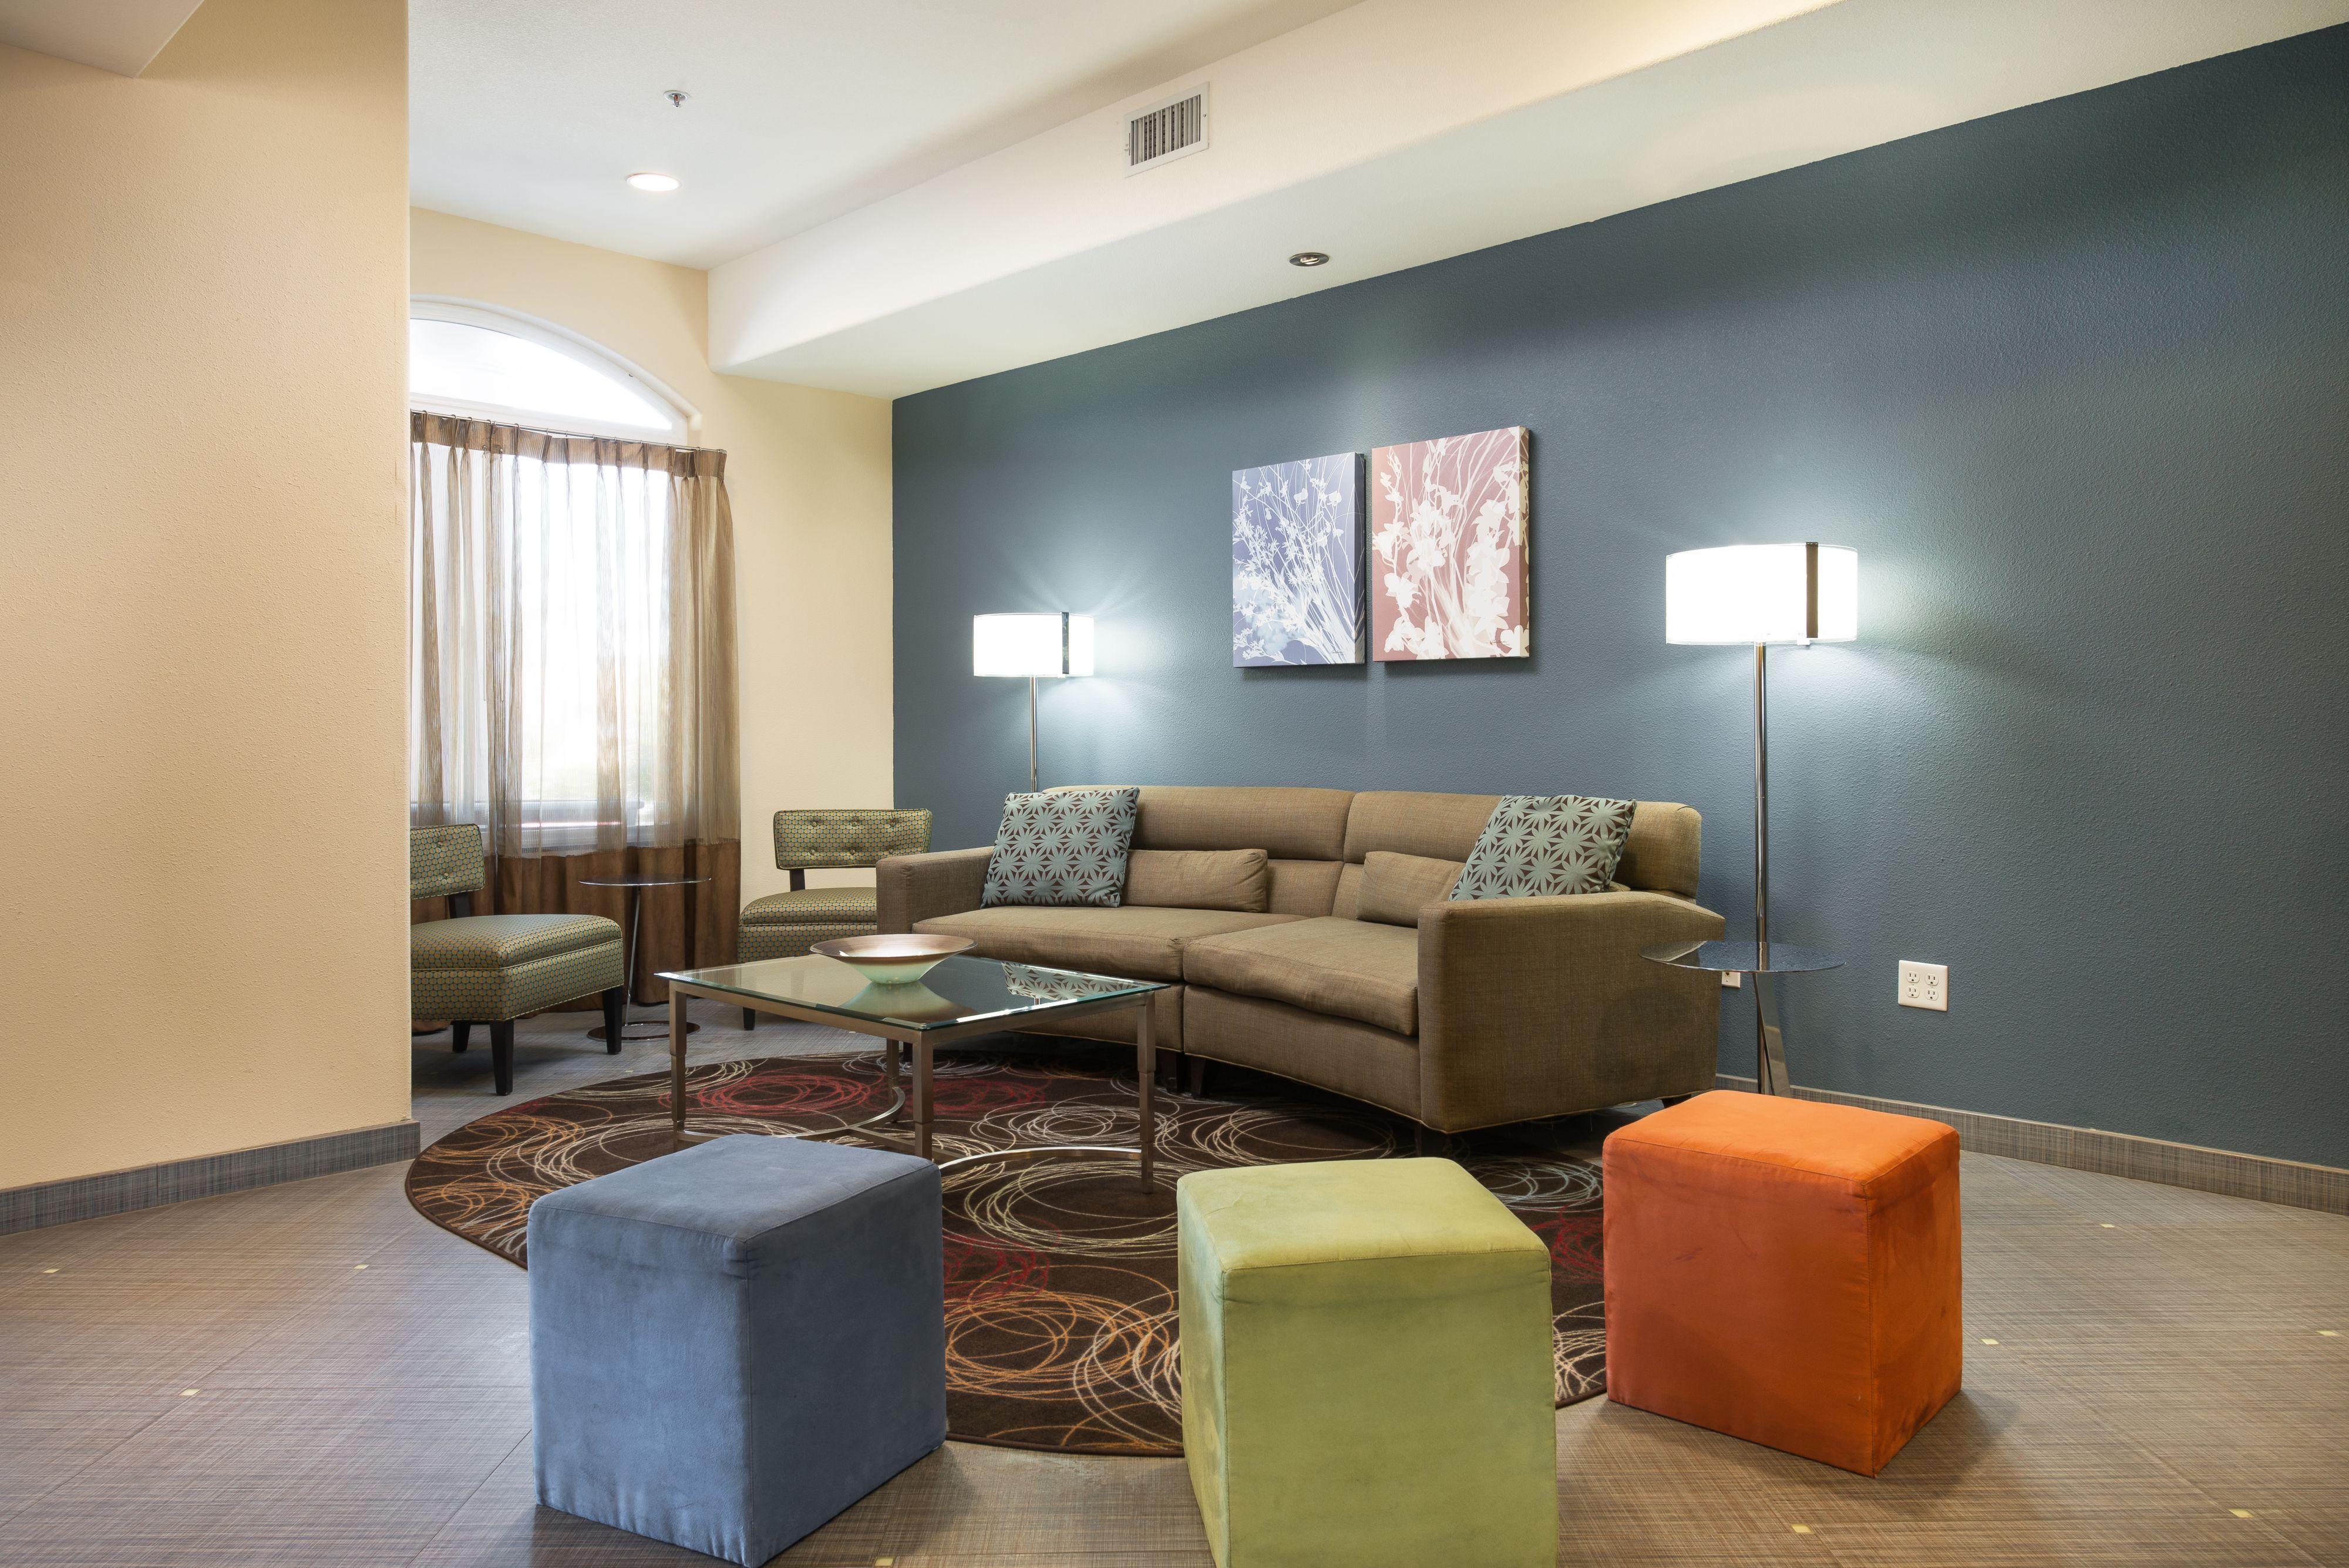 Holiday Inn Express & Suites Chowchilla - Yosemite Pk Area image 5